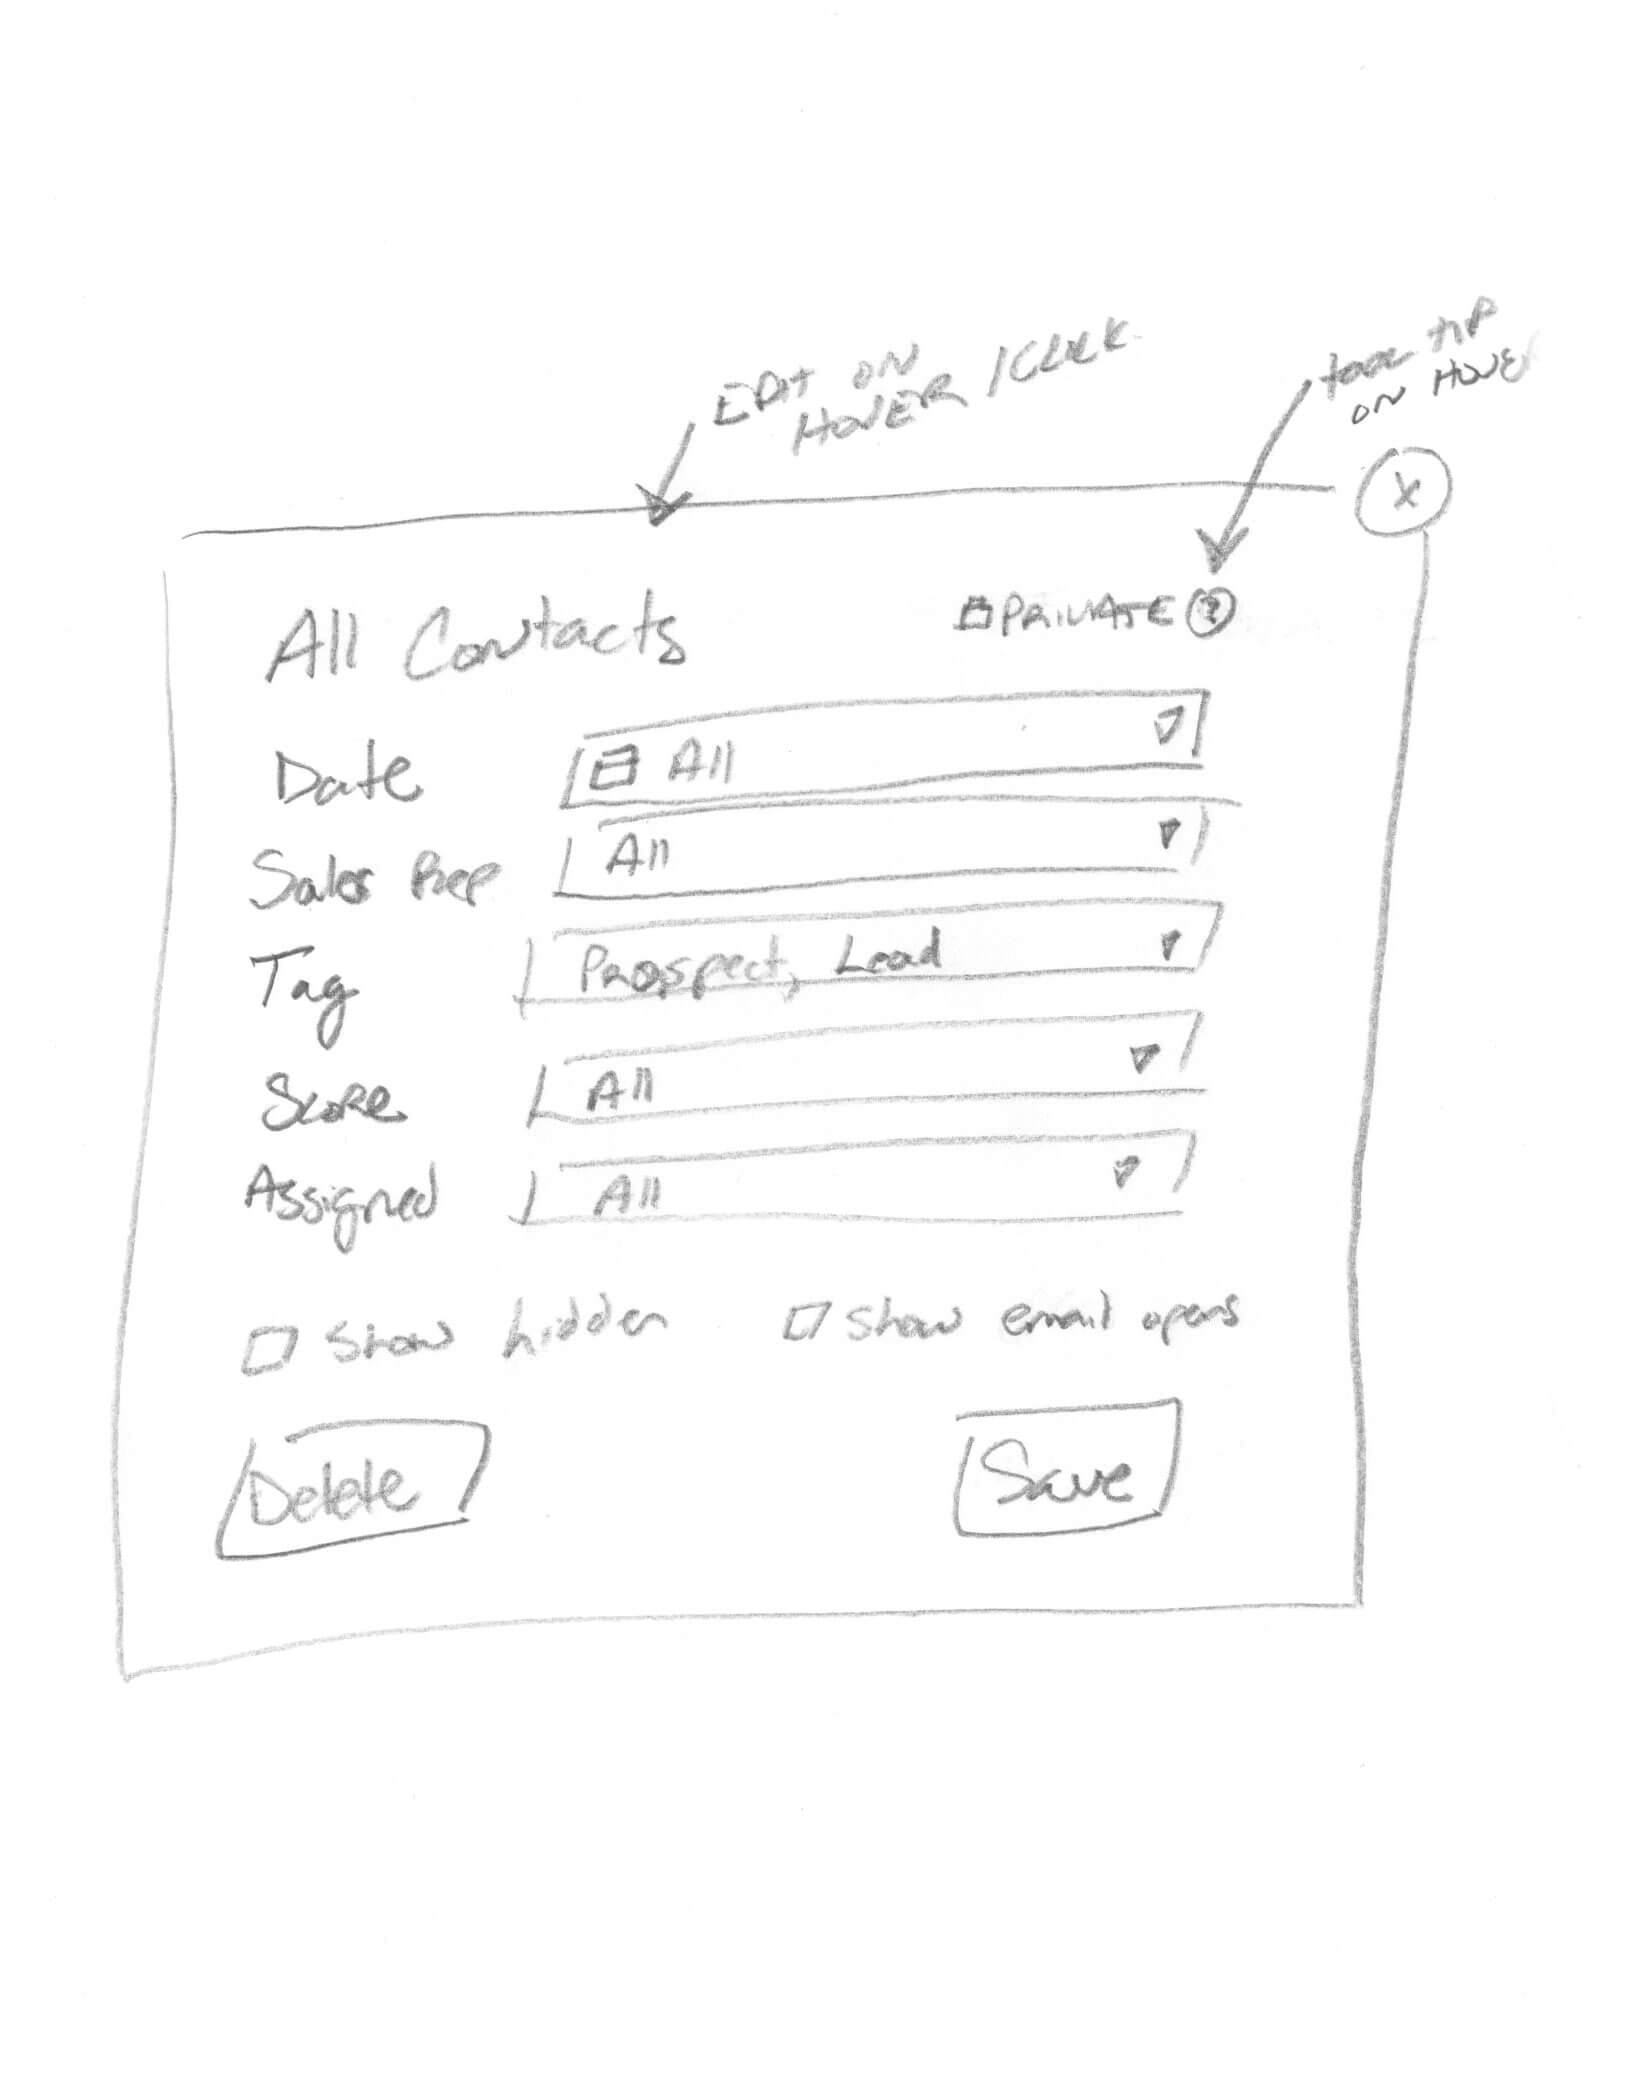 Contact Filter Concept Sketch